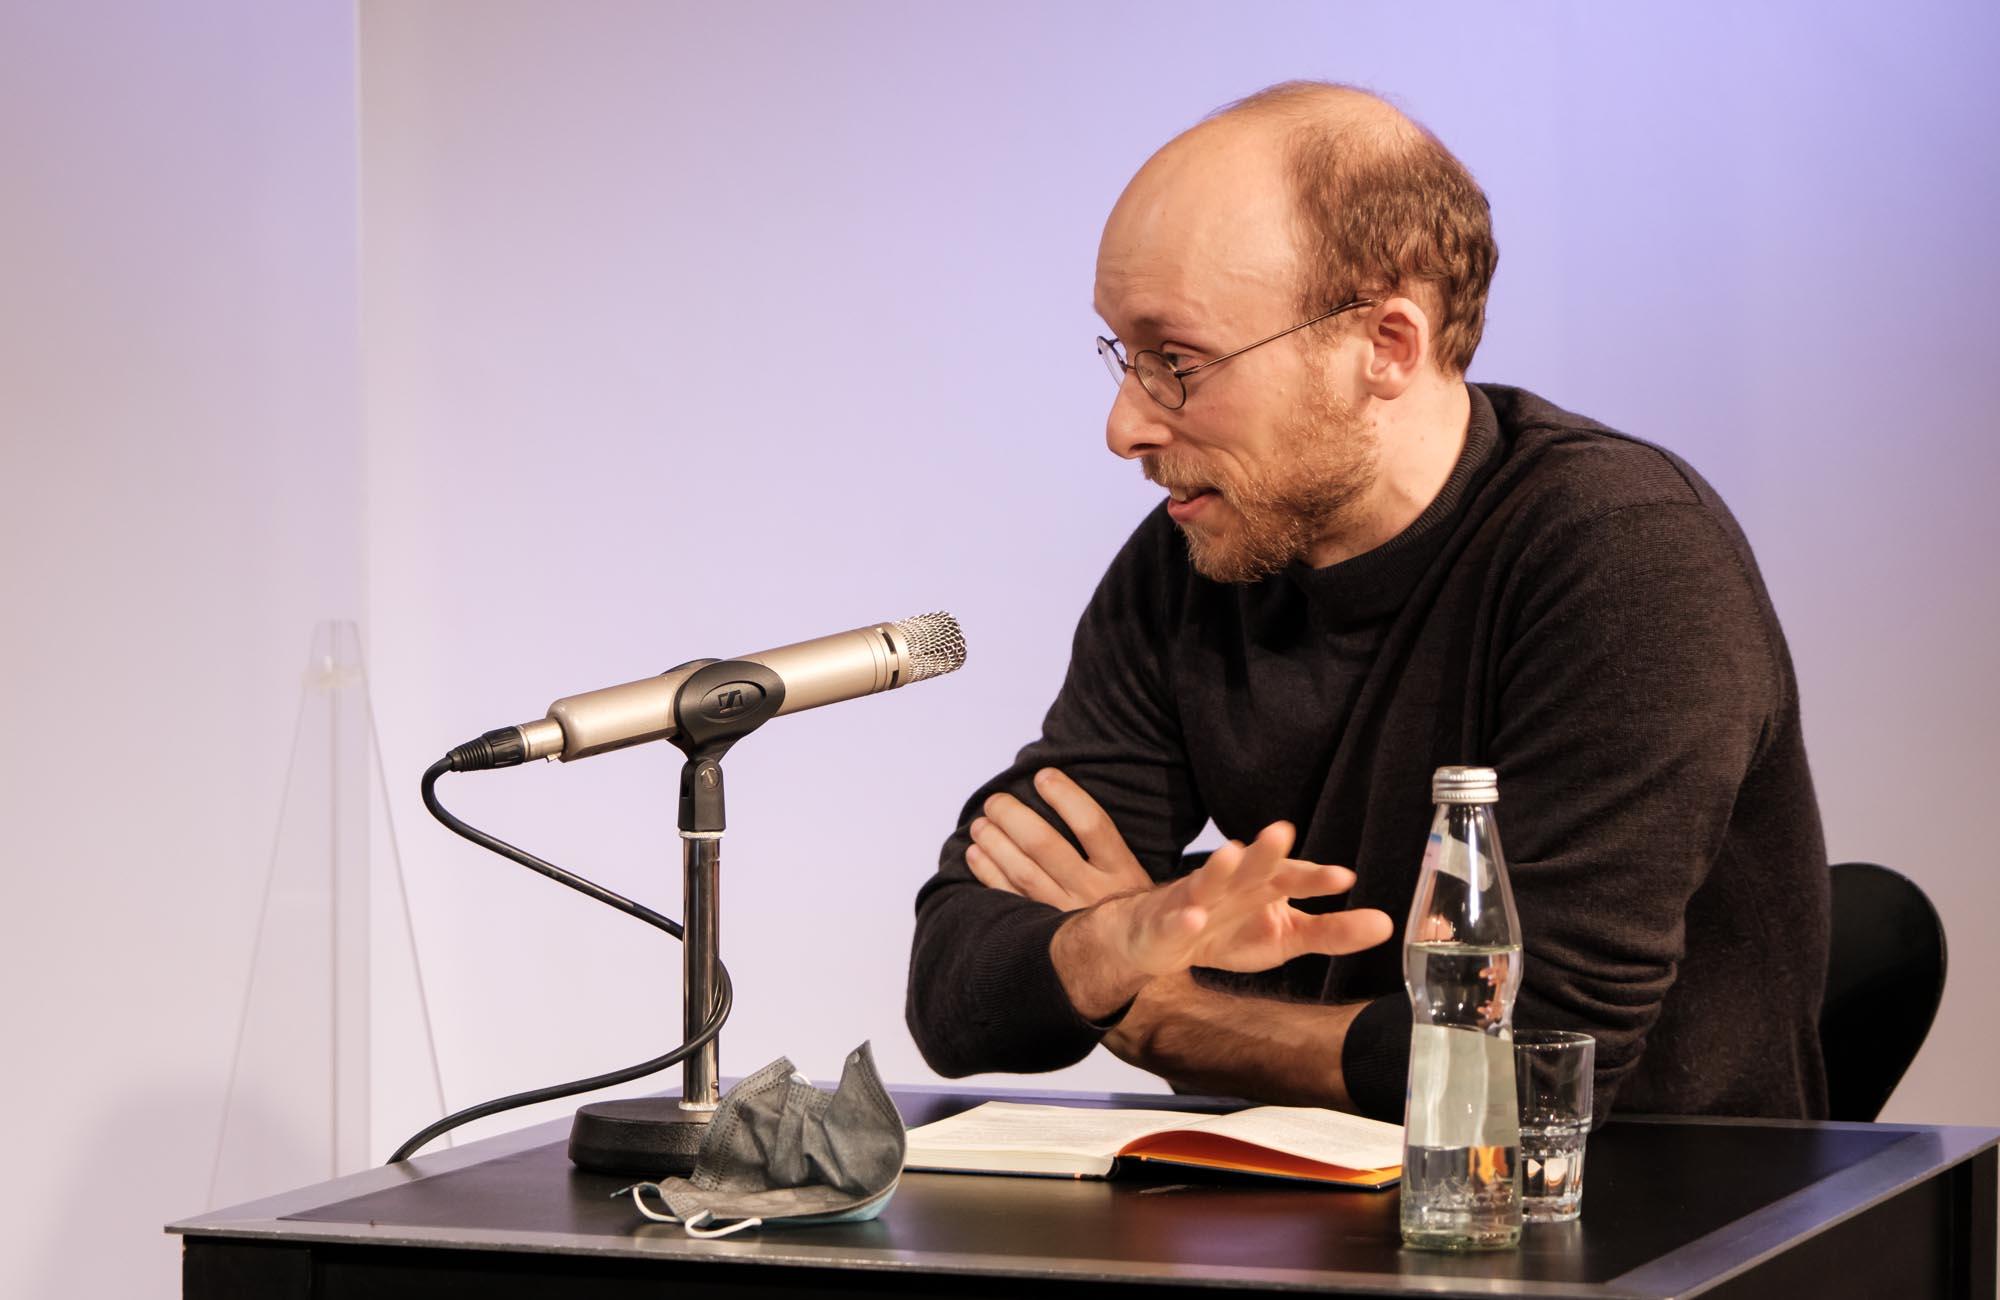 Christian Schulteisz: Wense <br/>(c) Sebastian Wenzel